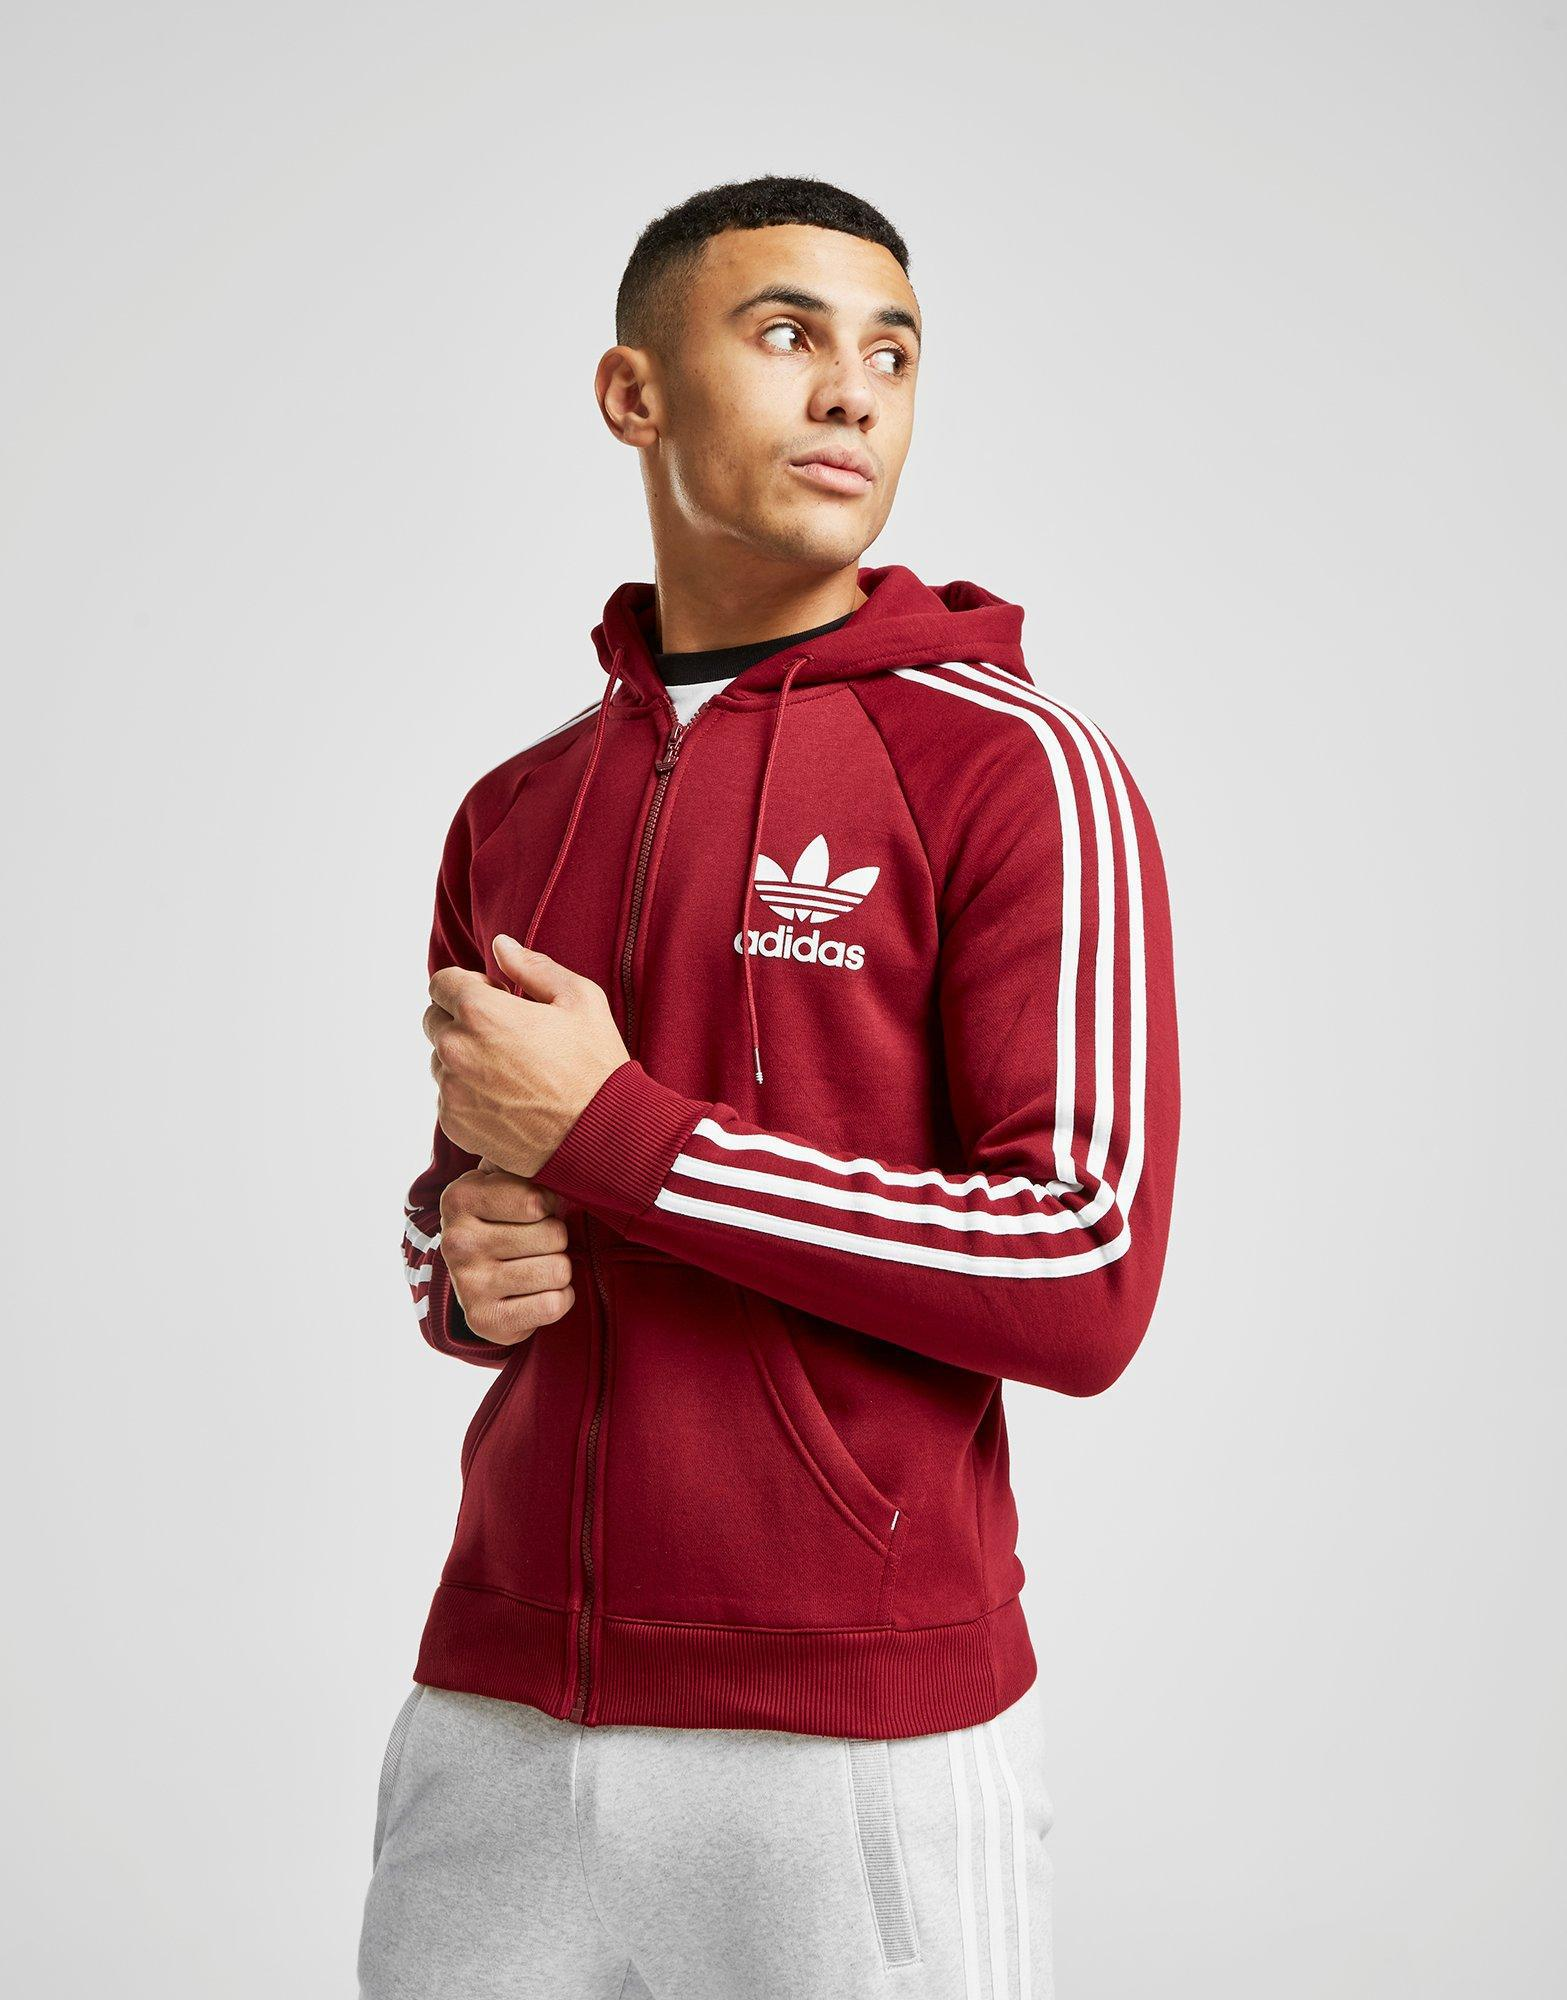 f474f854e8a7 adidas Originals California Full Zip Hoodie in Red for Men - Lyst